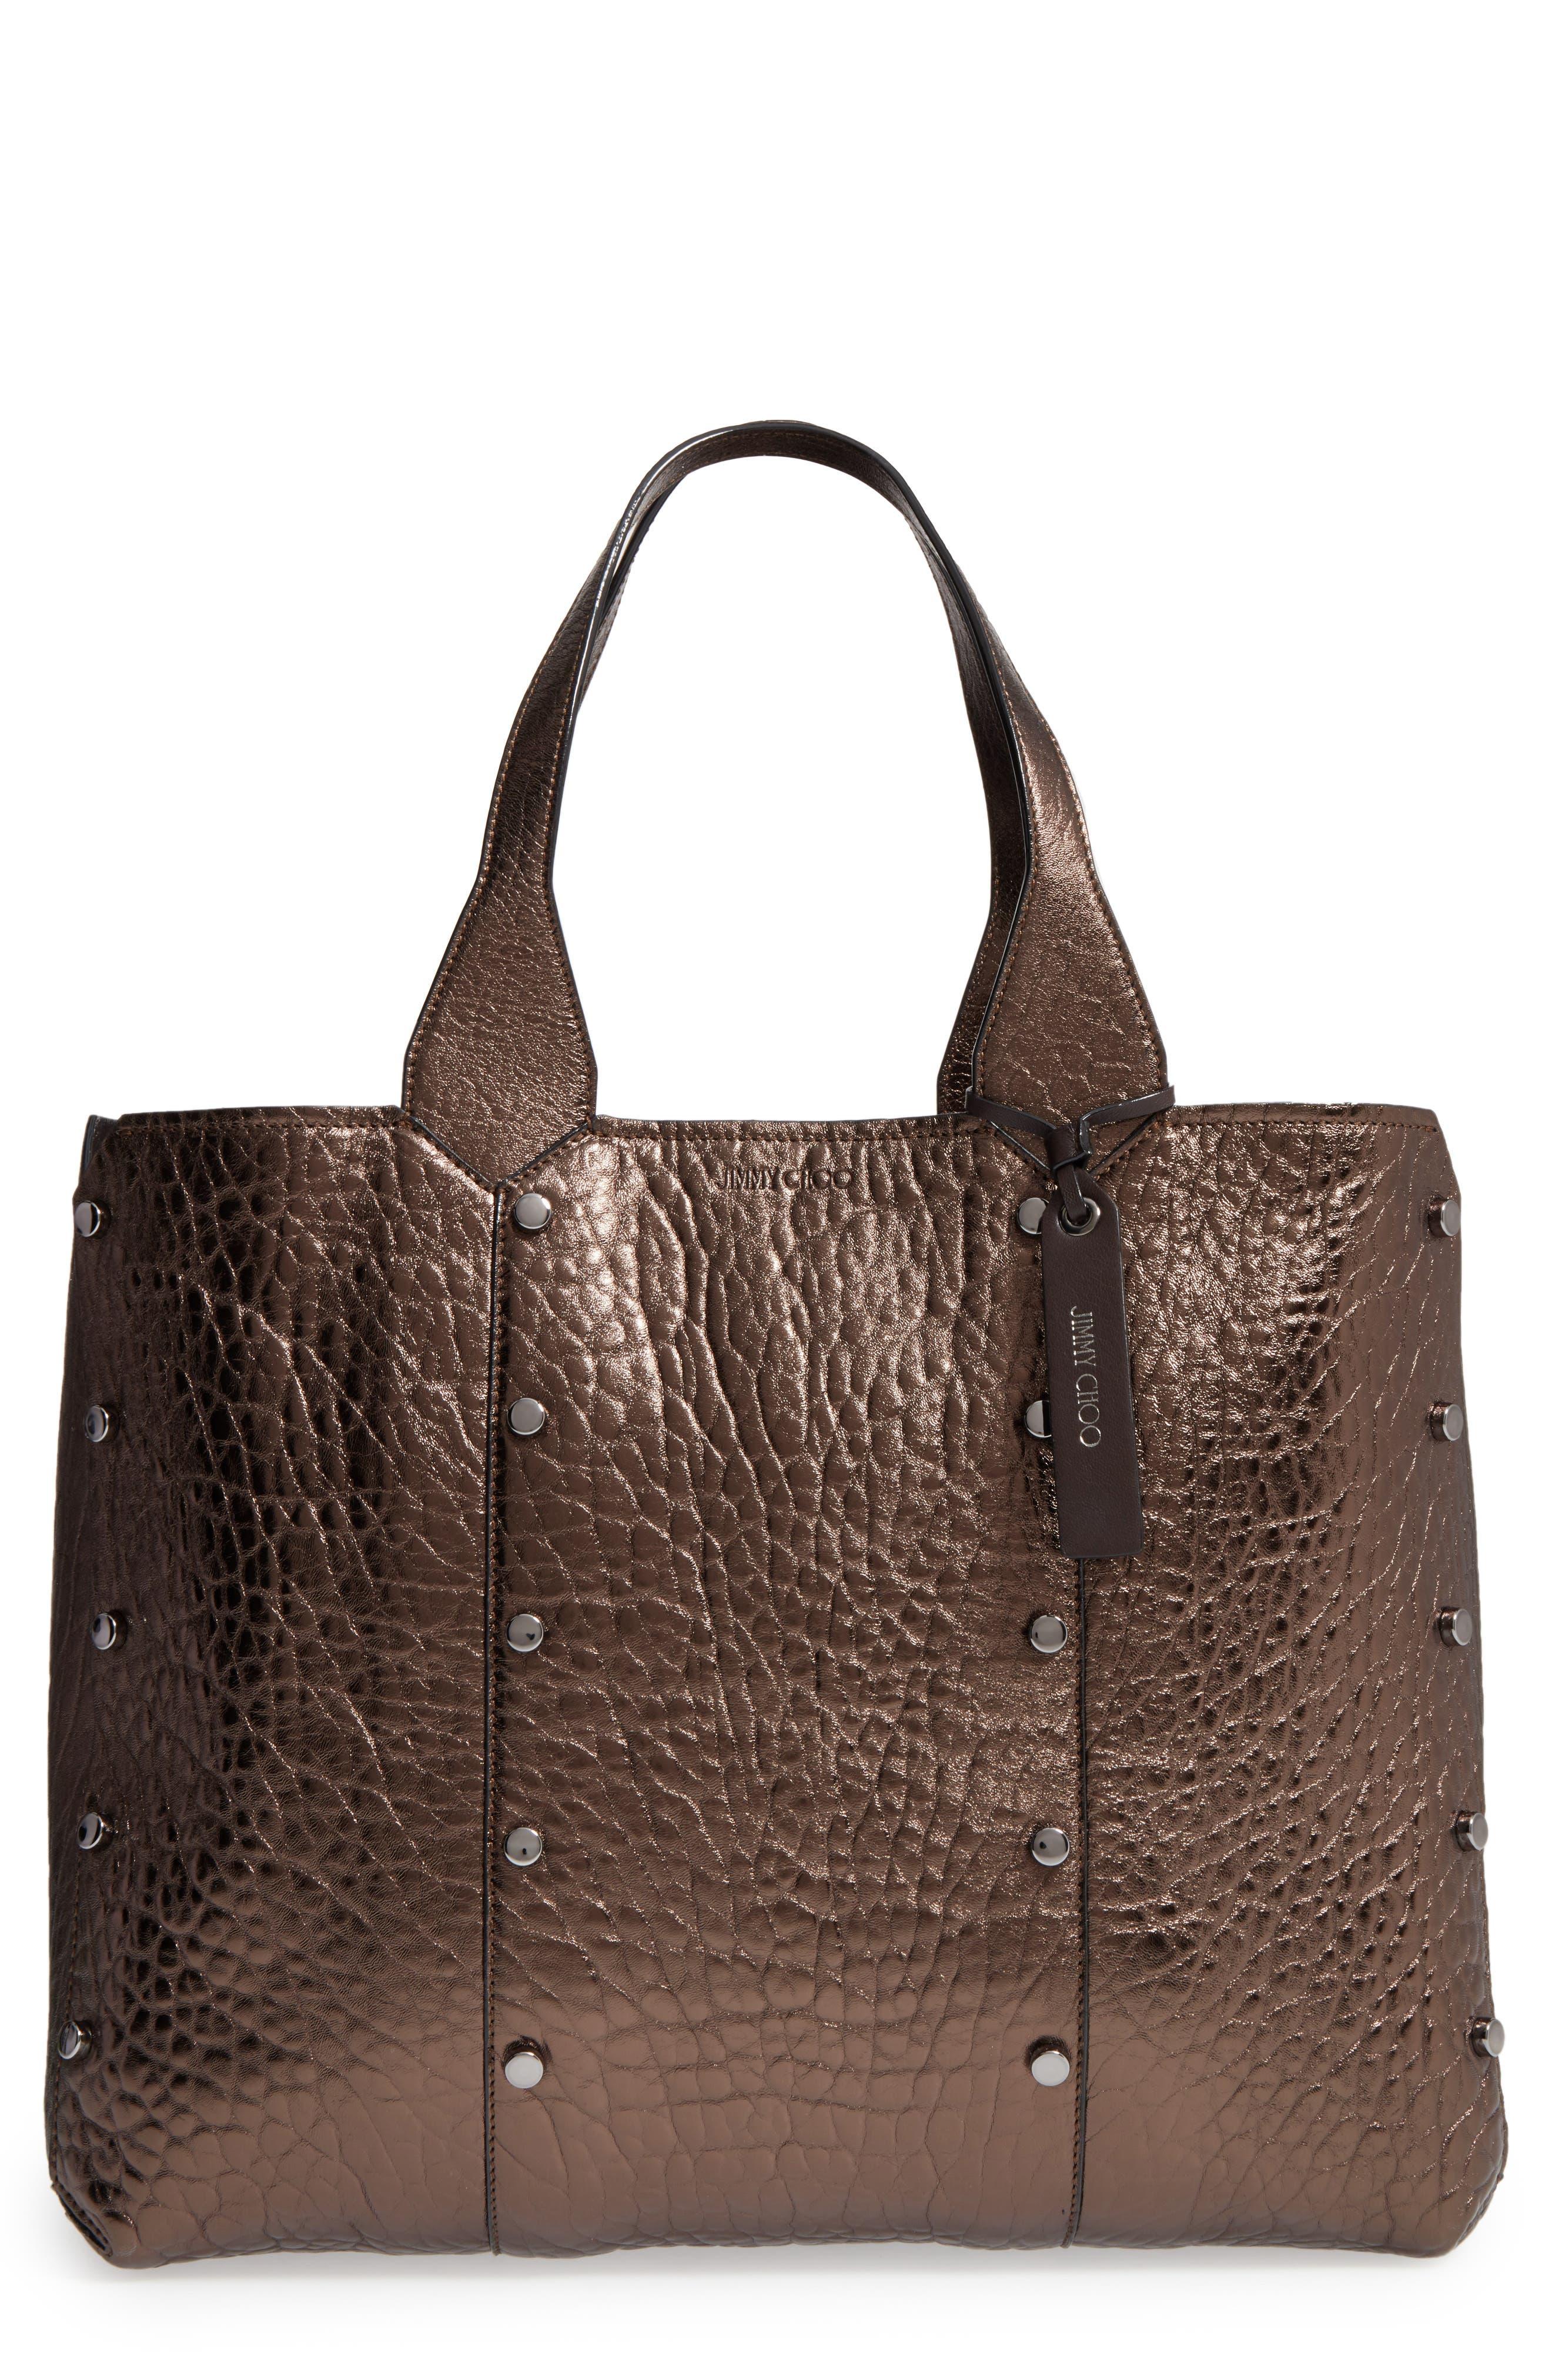 Lockett Metallic Leather Shopper,                             Main thumbnail 1, color,                             200